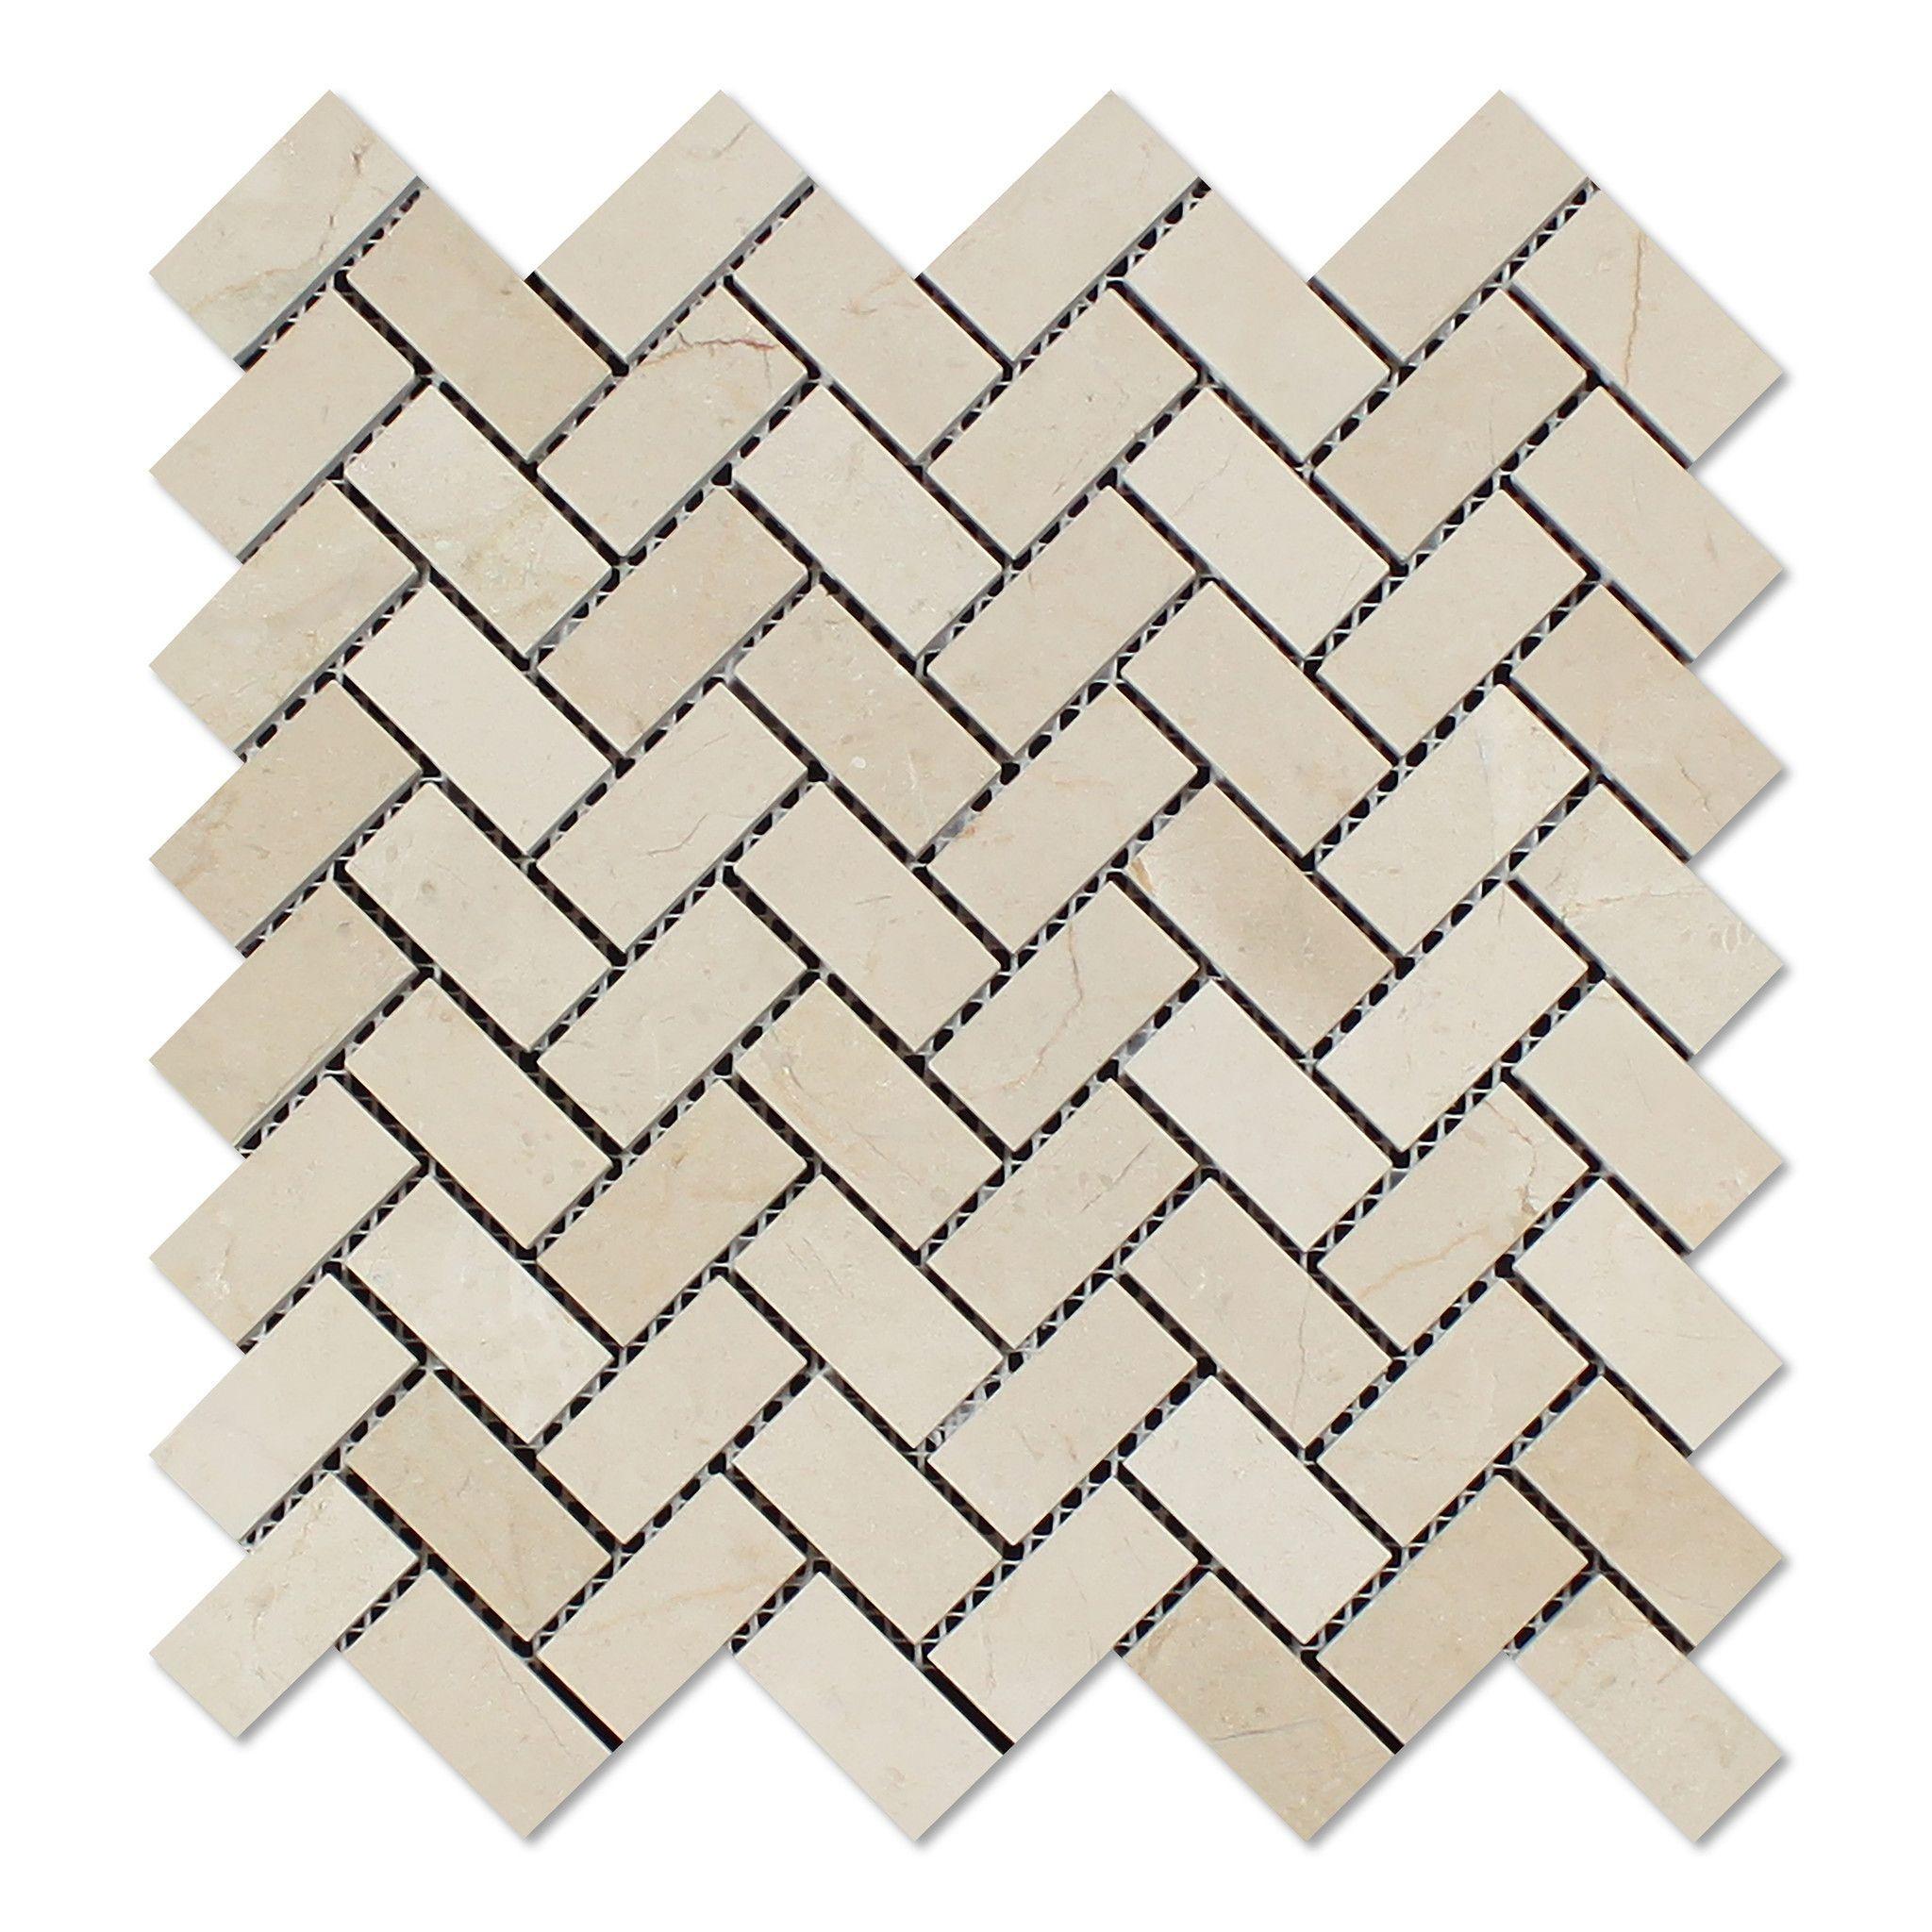 Crema marfil marble polished 1 x 2 herringbone mosaic tile buy crema marfil marble polished 1 x 2 herringbone mosaic tile sample product attributes item dailygadgetfo Images